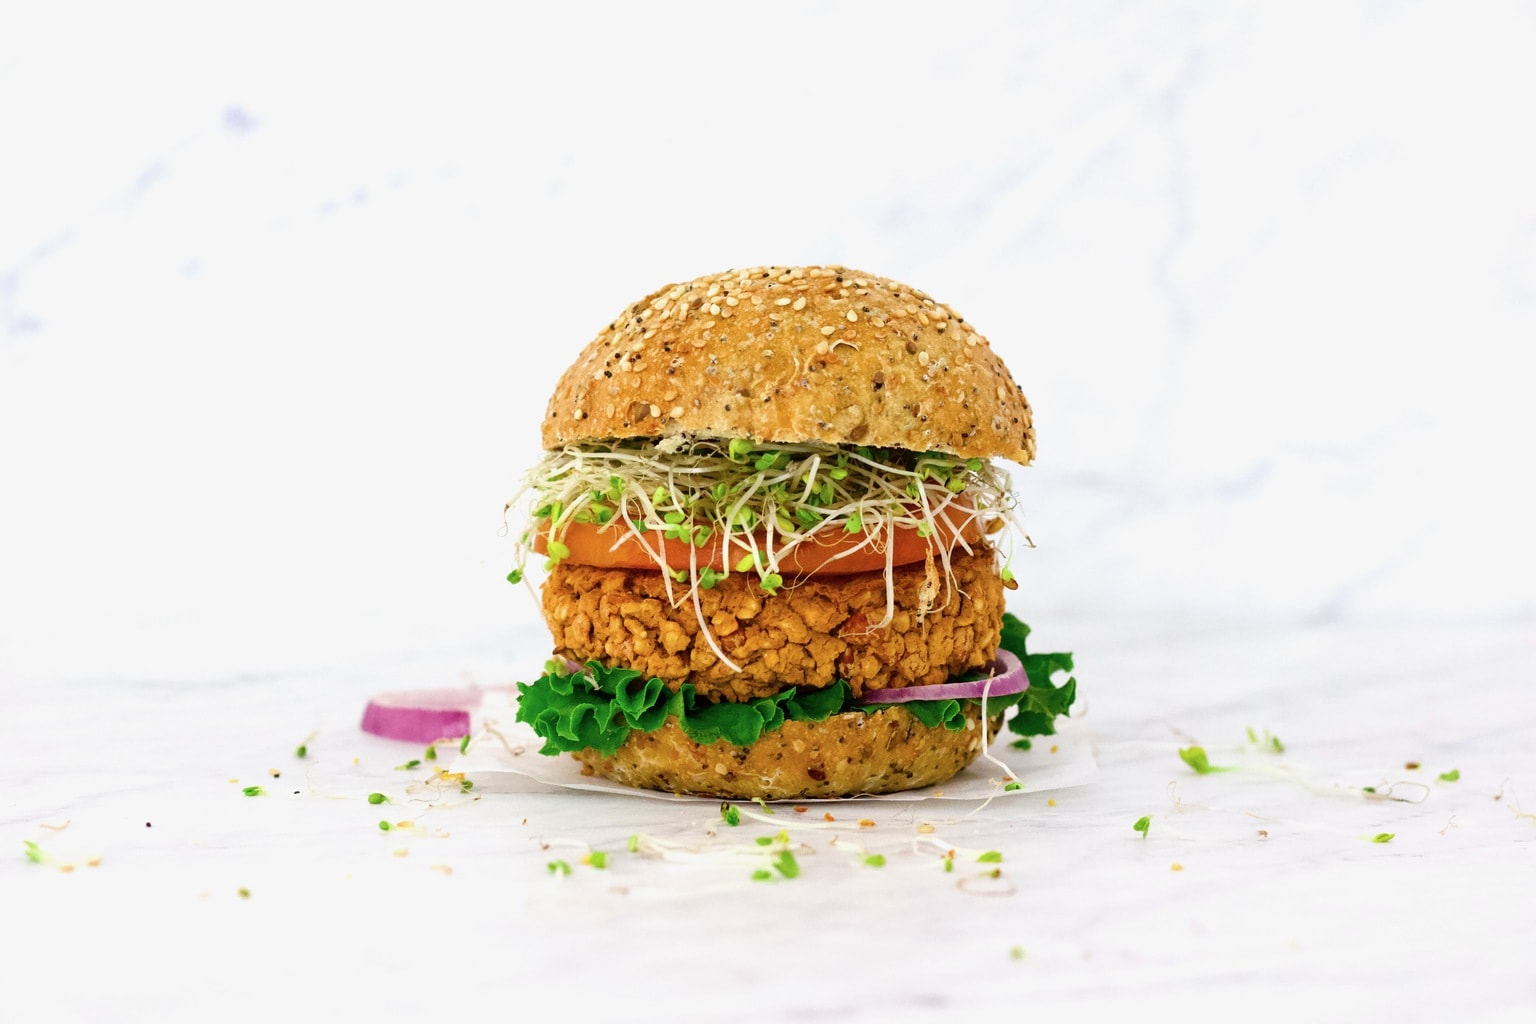 Easy Chipotle Pinto Bean Veggie Burgers (Vegan, Gluten-Free, Low-Fat, Oil-Free)